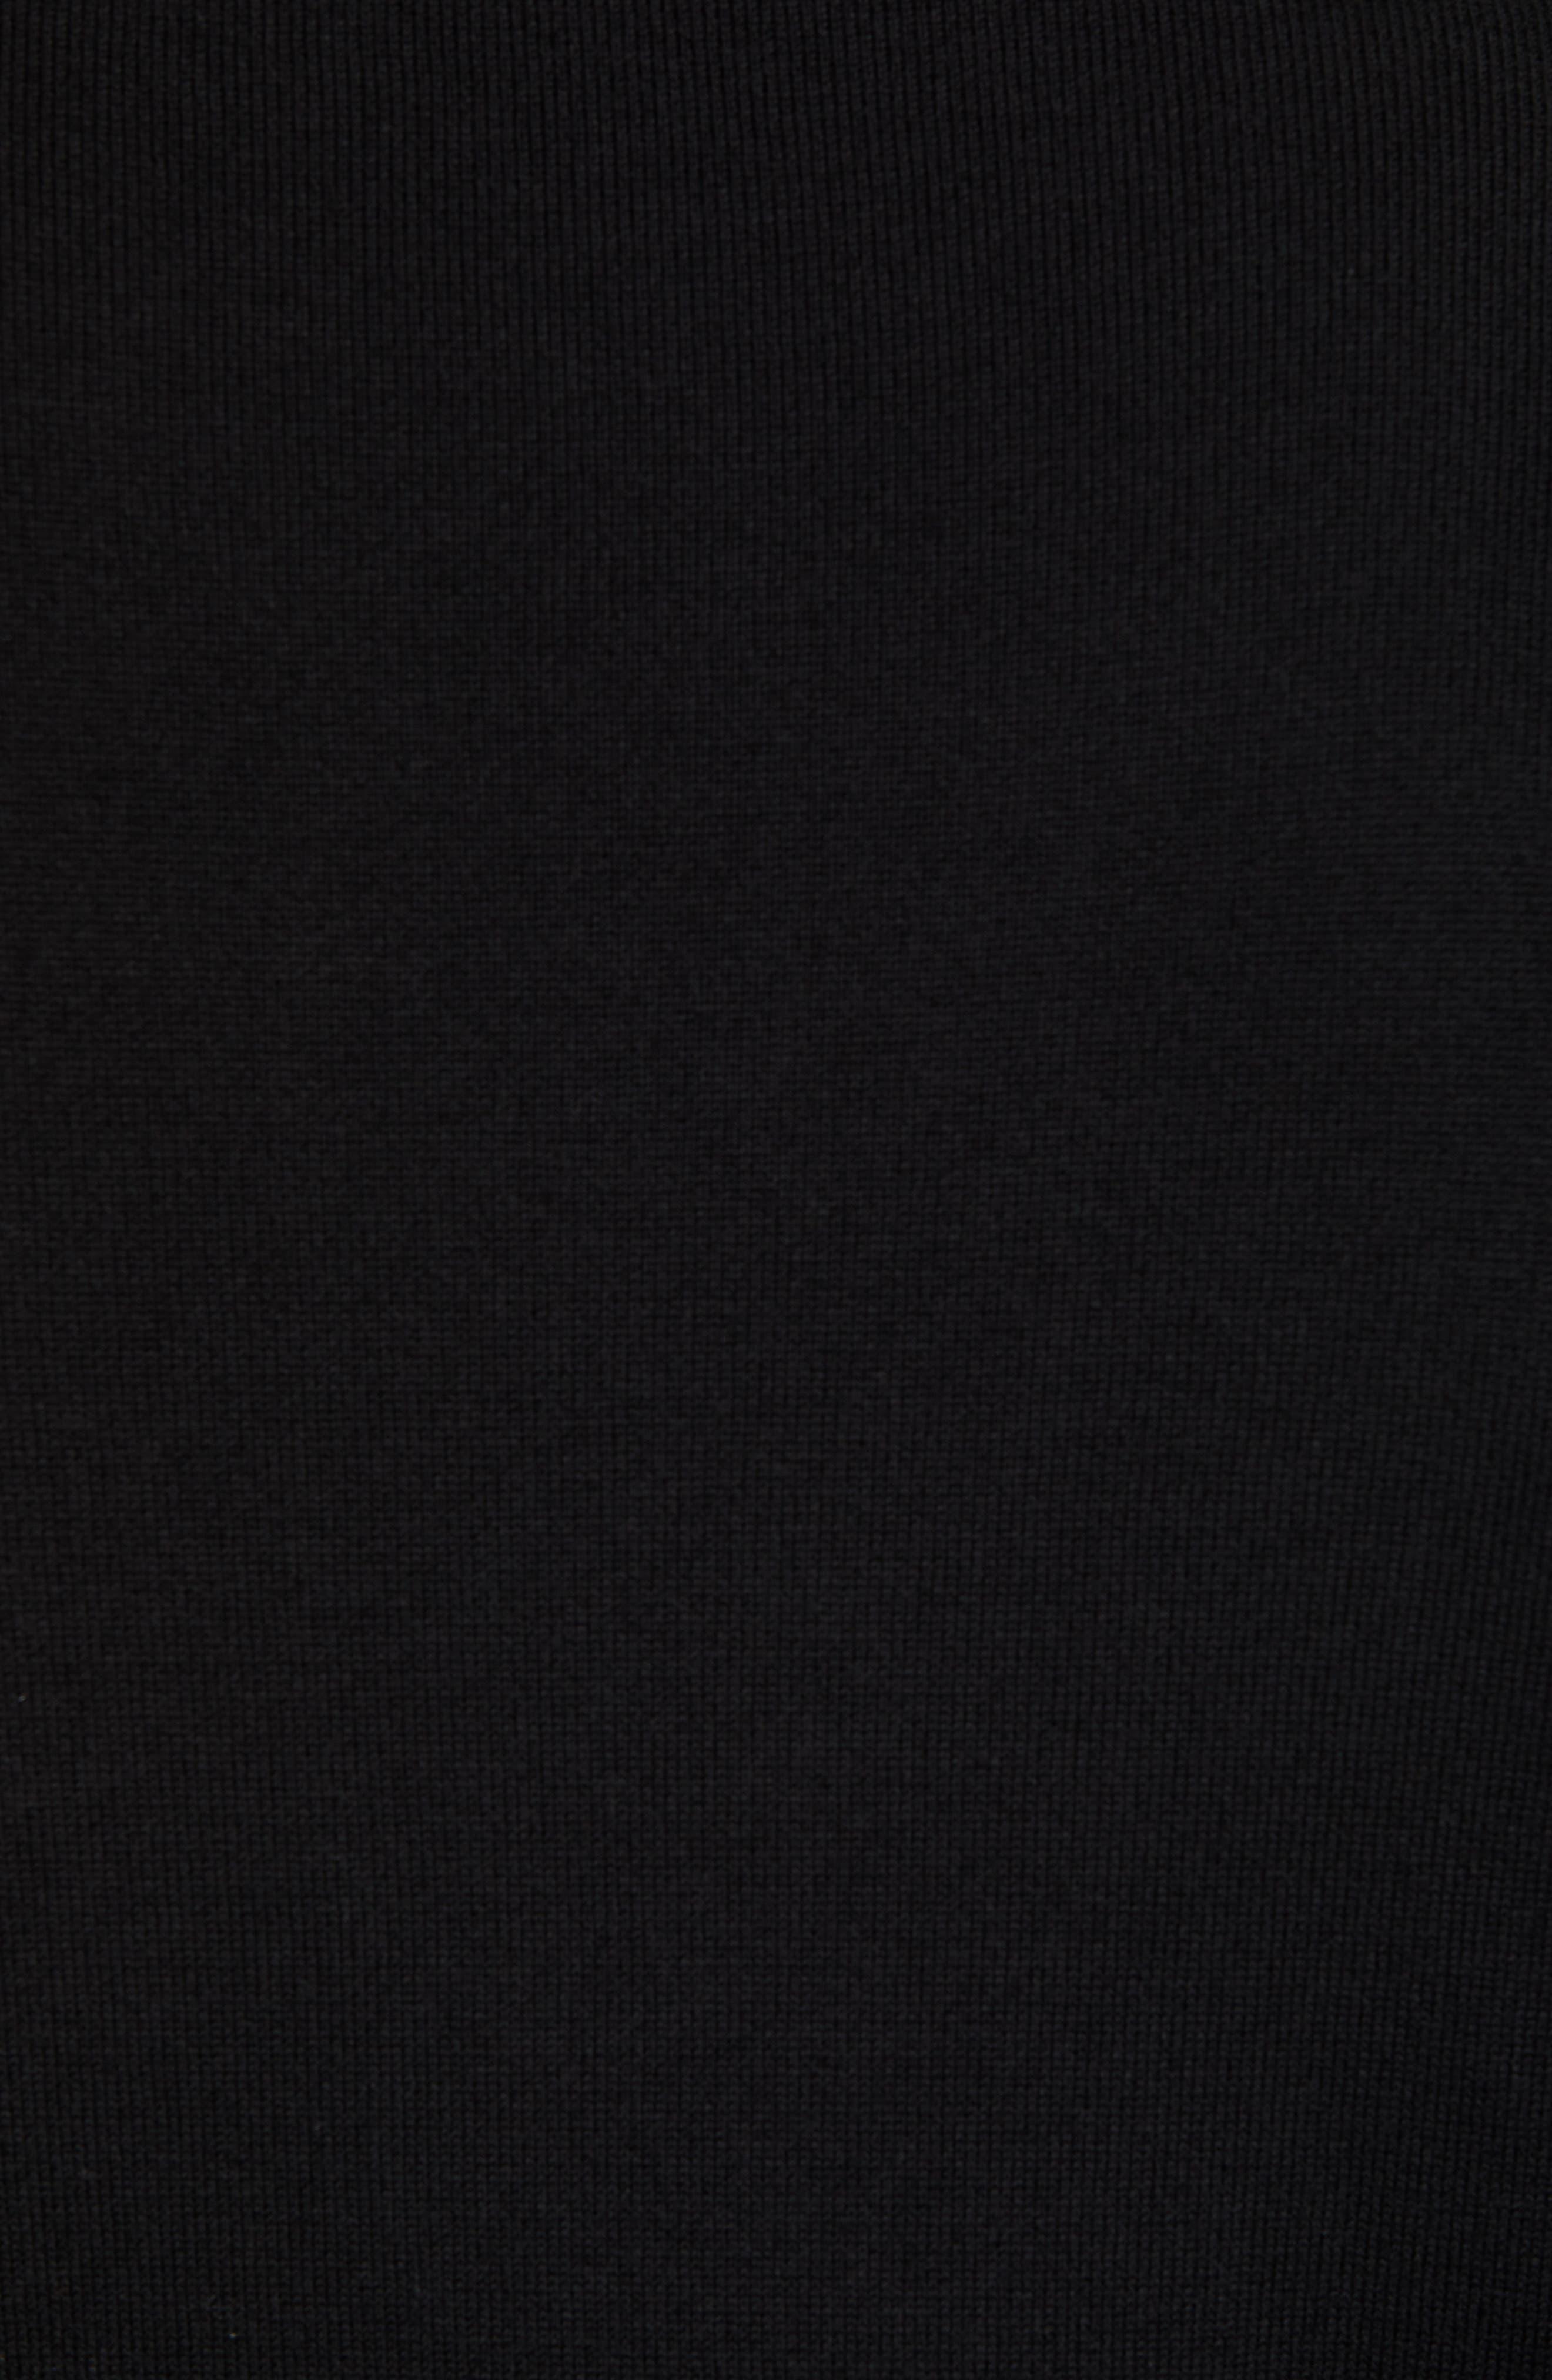 Baltimore Ravens - Lakemont Regular Fit Quarter Zip Sweater,                             Alternate thumbnail 5, color,                             BLACK